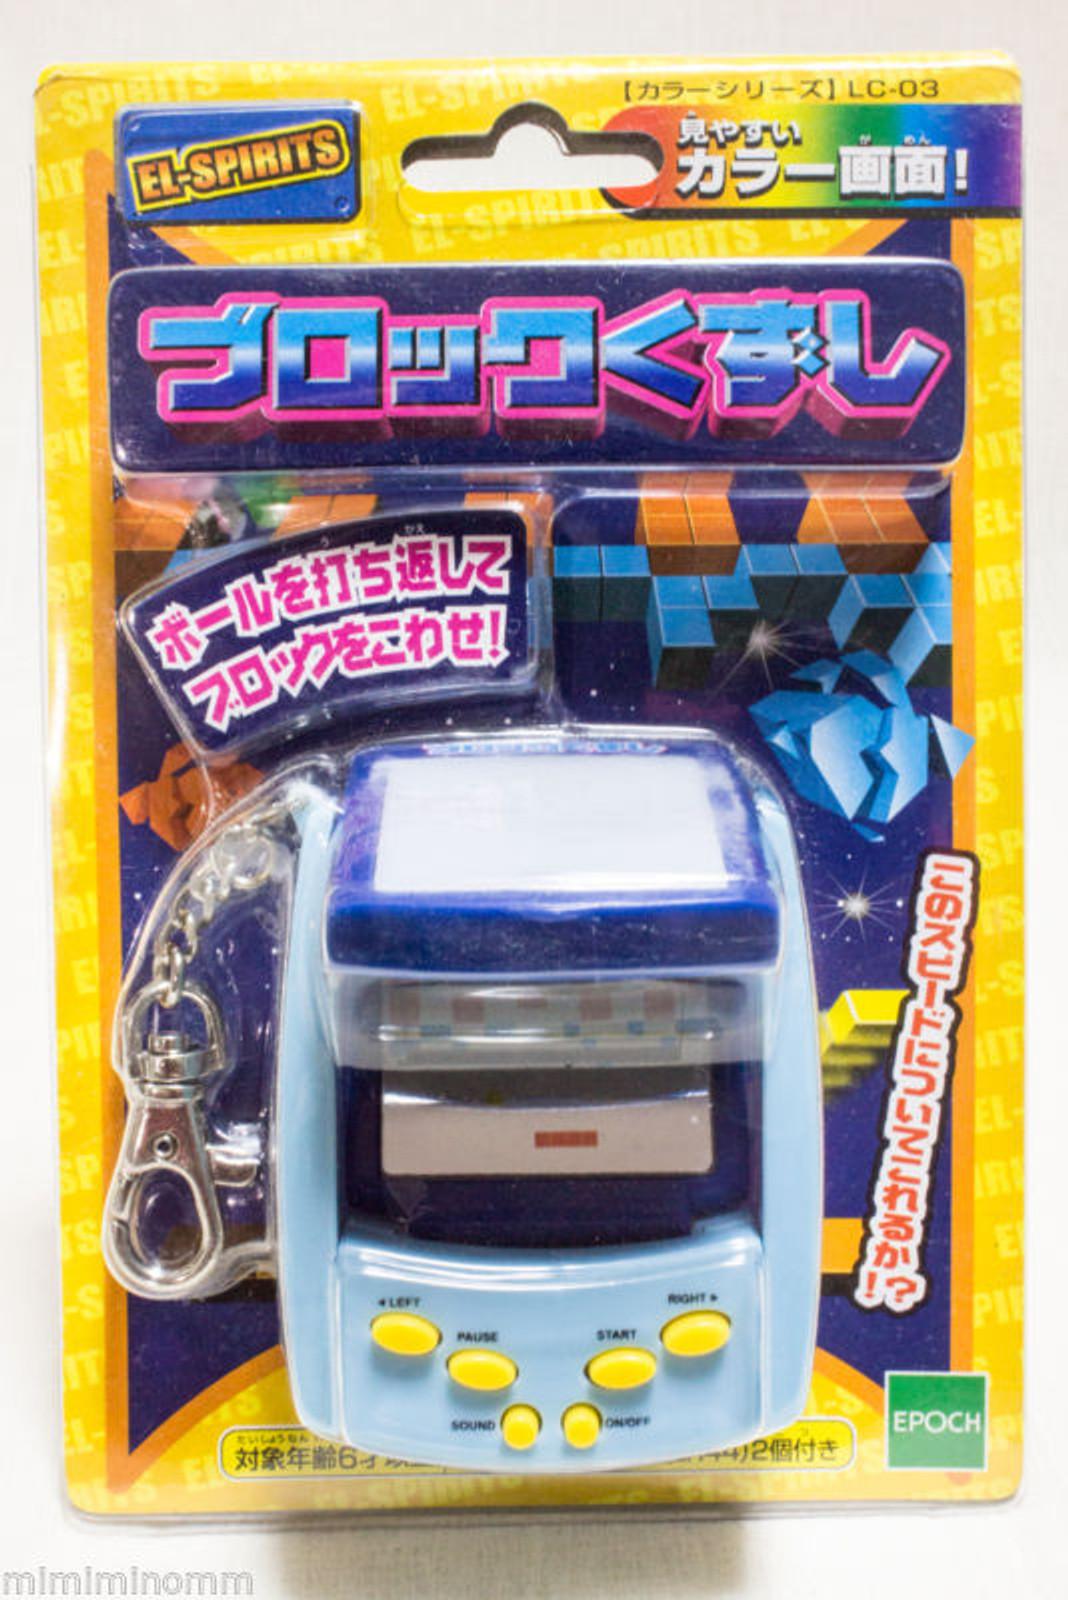 Breakout Mini Game Key Chain Color Ver. EPOCH LC-03 JAPAN ANIME MANGA